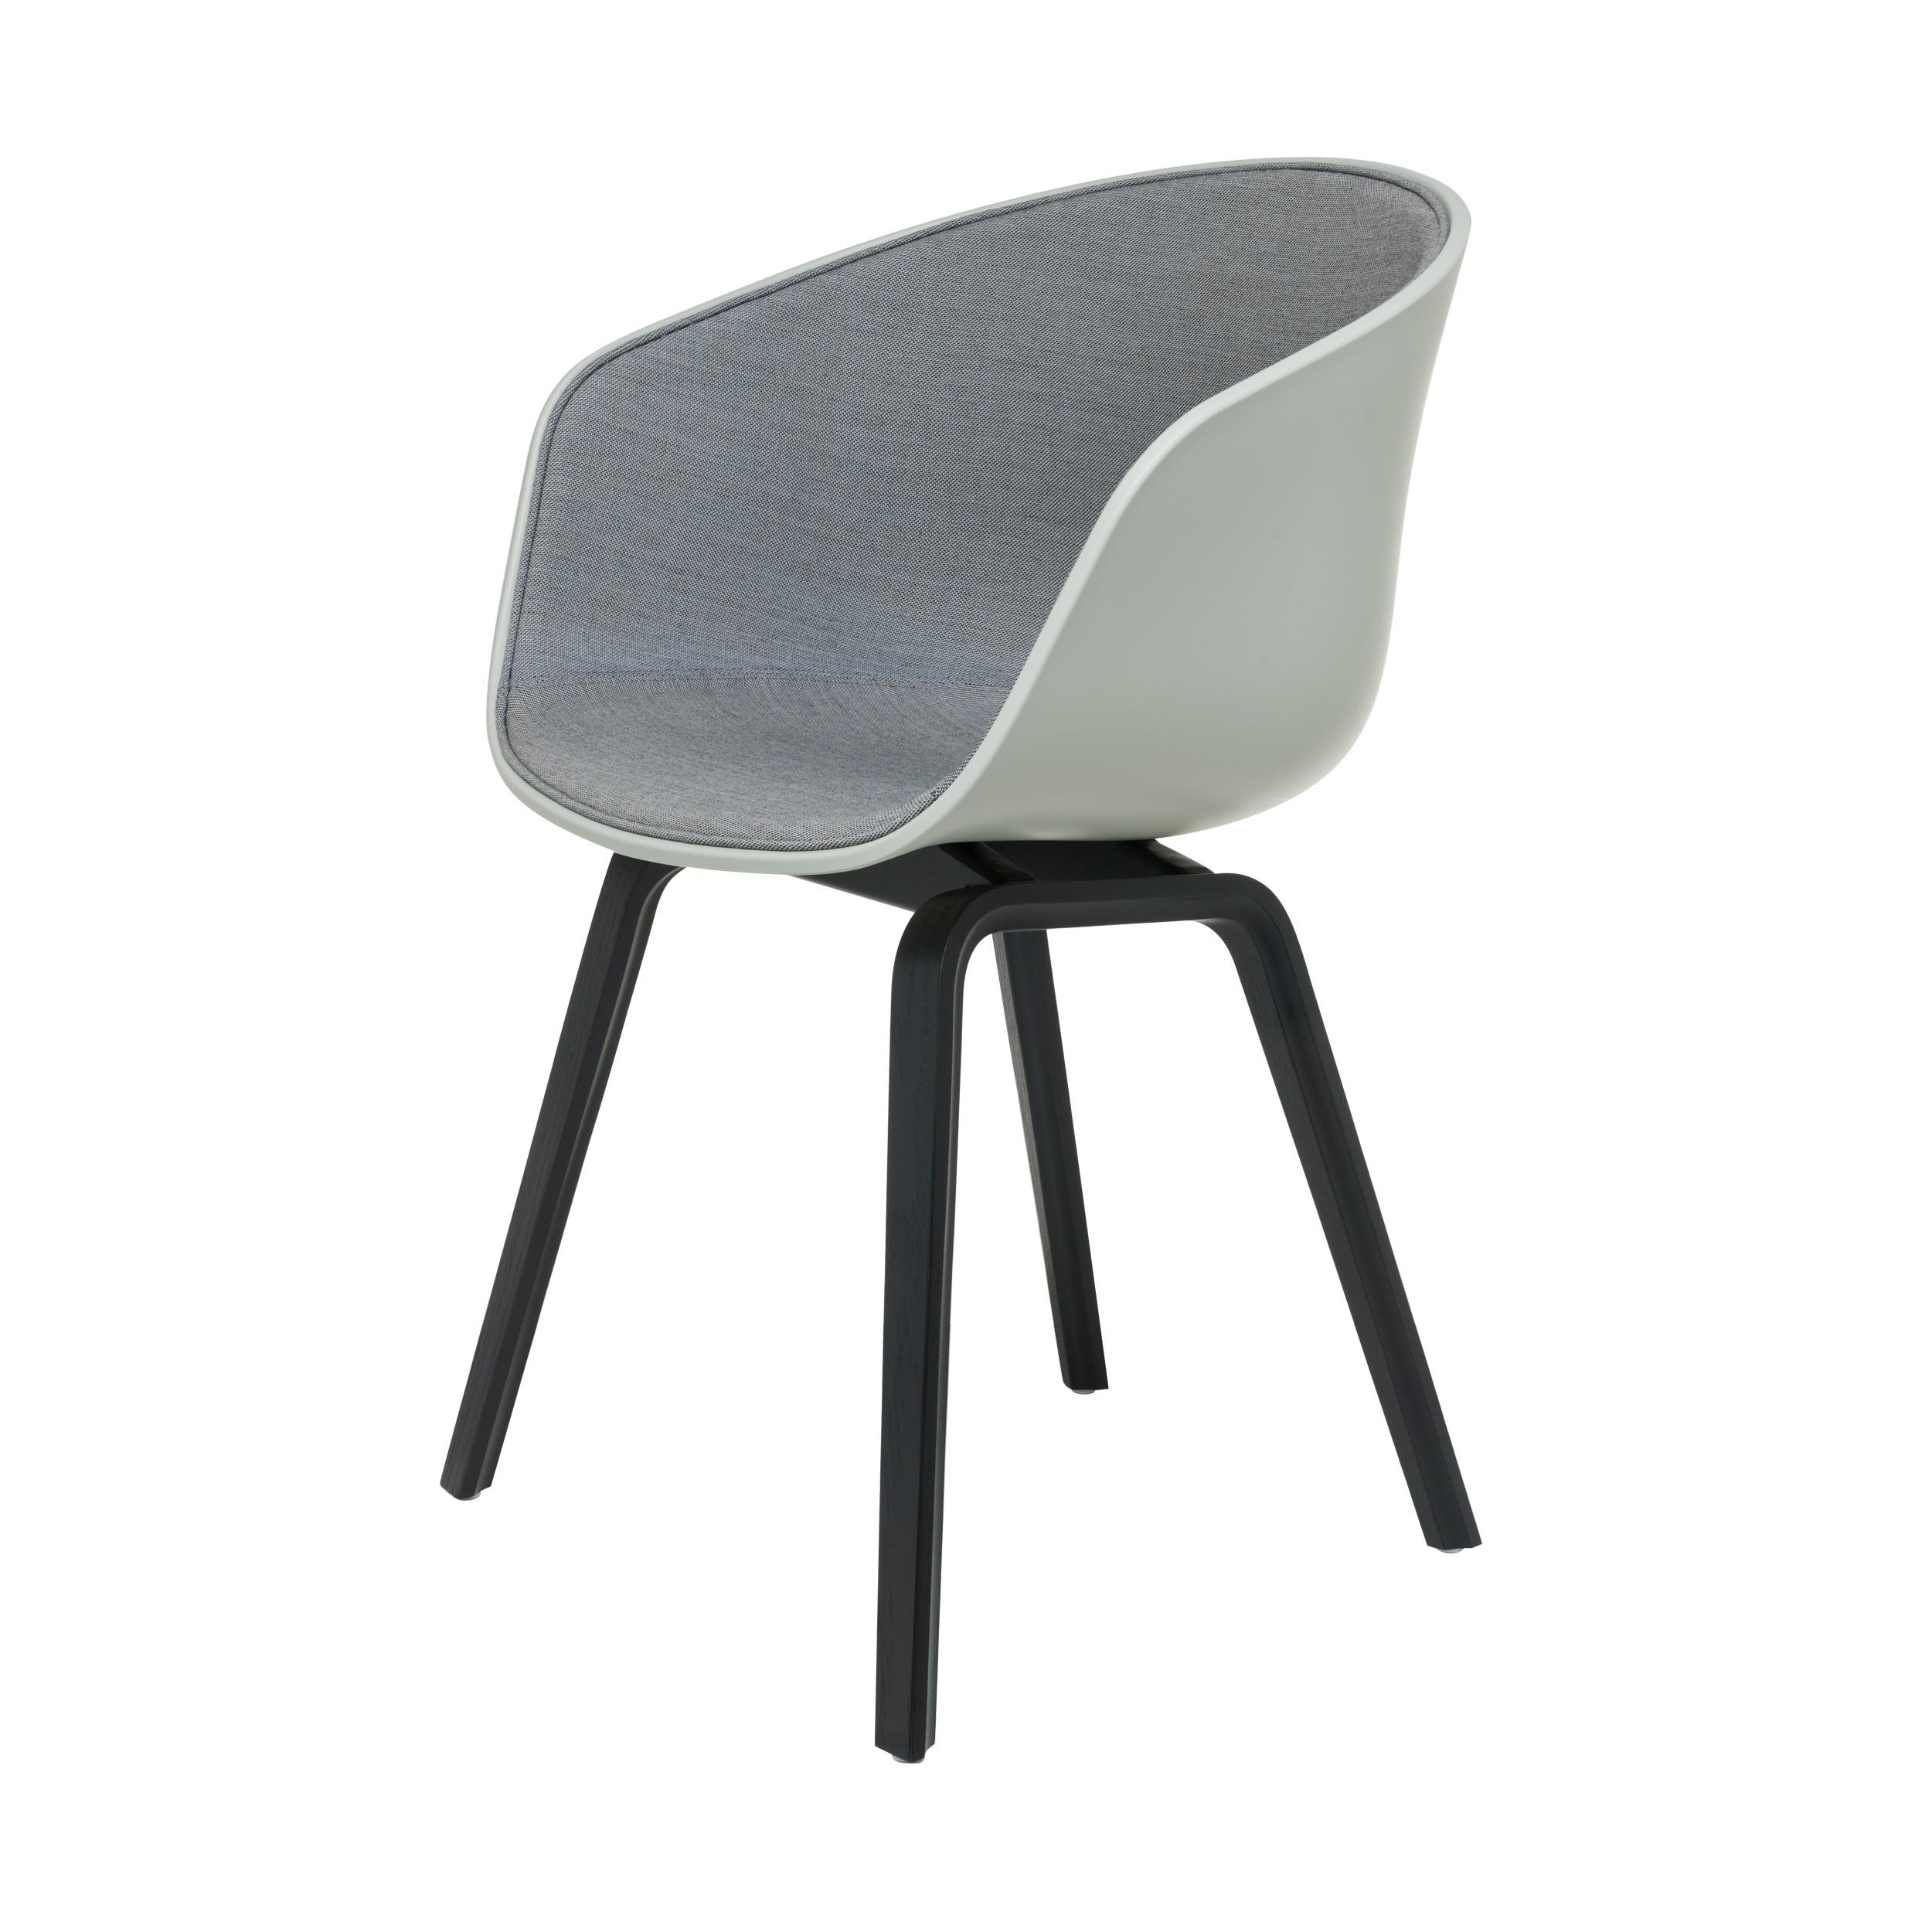 about a chair aac22 spiegelpolster stuhl gebeizt schwarz. Black Bedroom Furniture Sets. Home Design Ideas